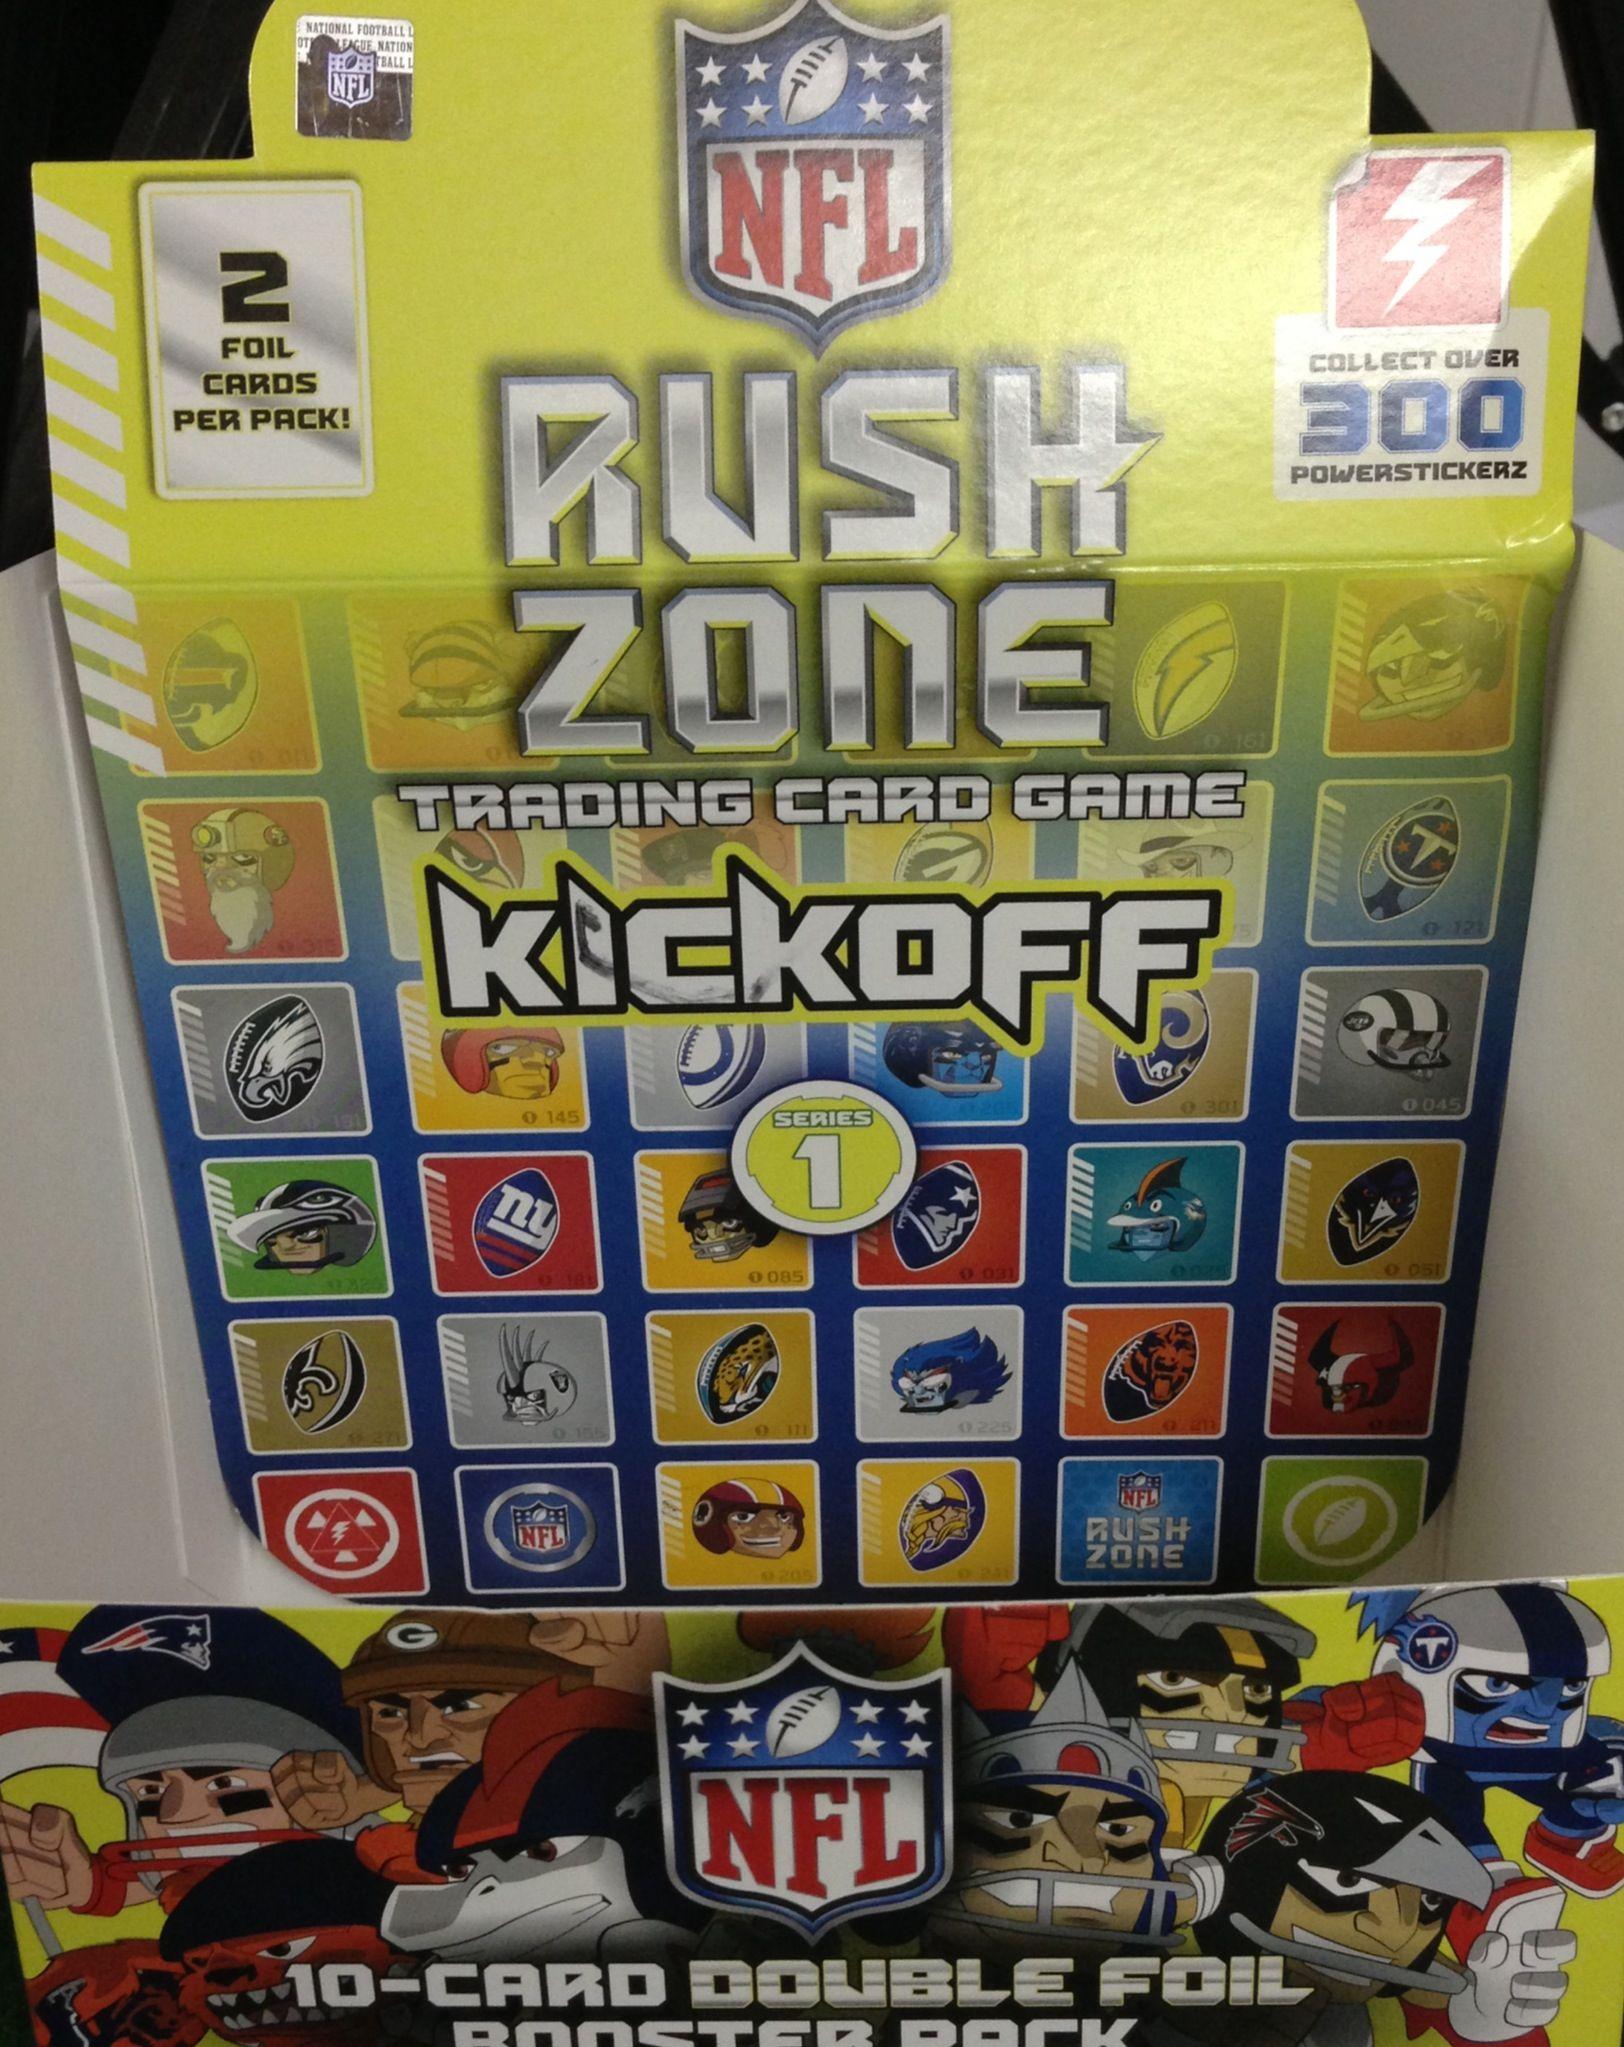 NFL RUSH ZONE Trading Card Game NFL rushzone tcg